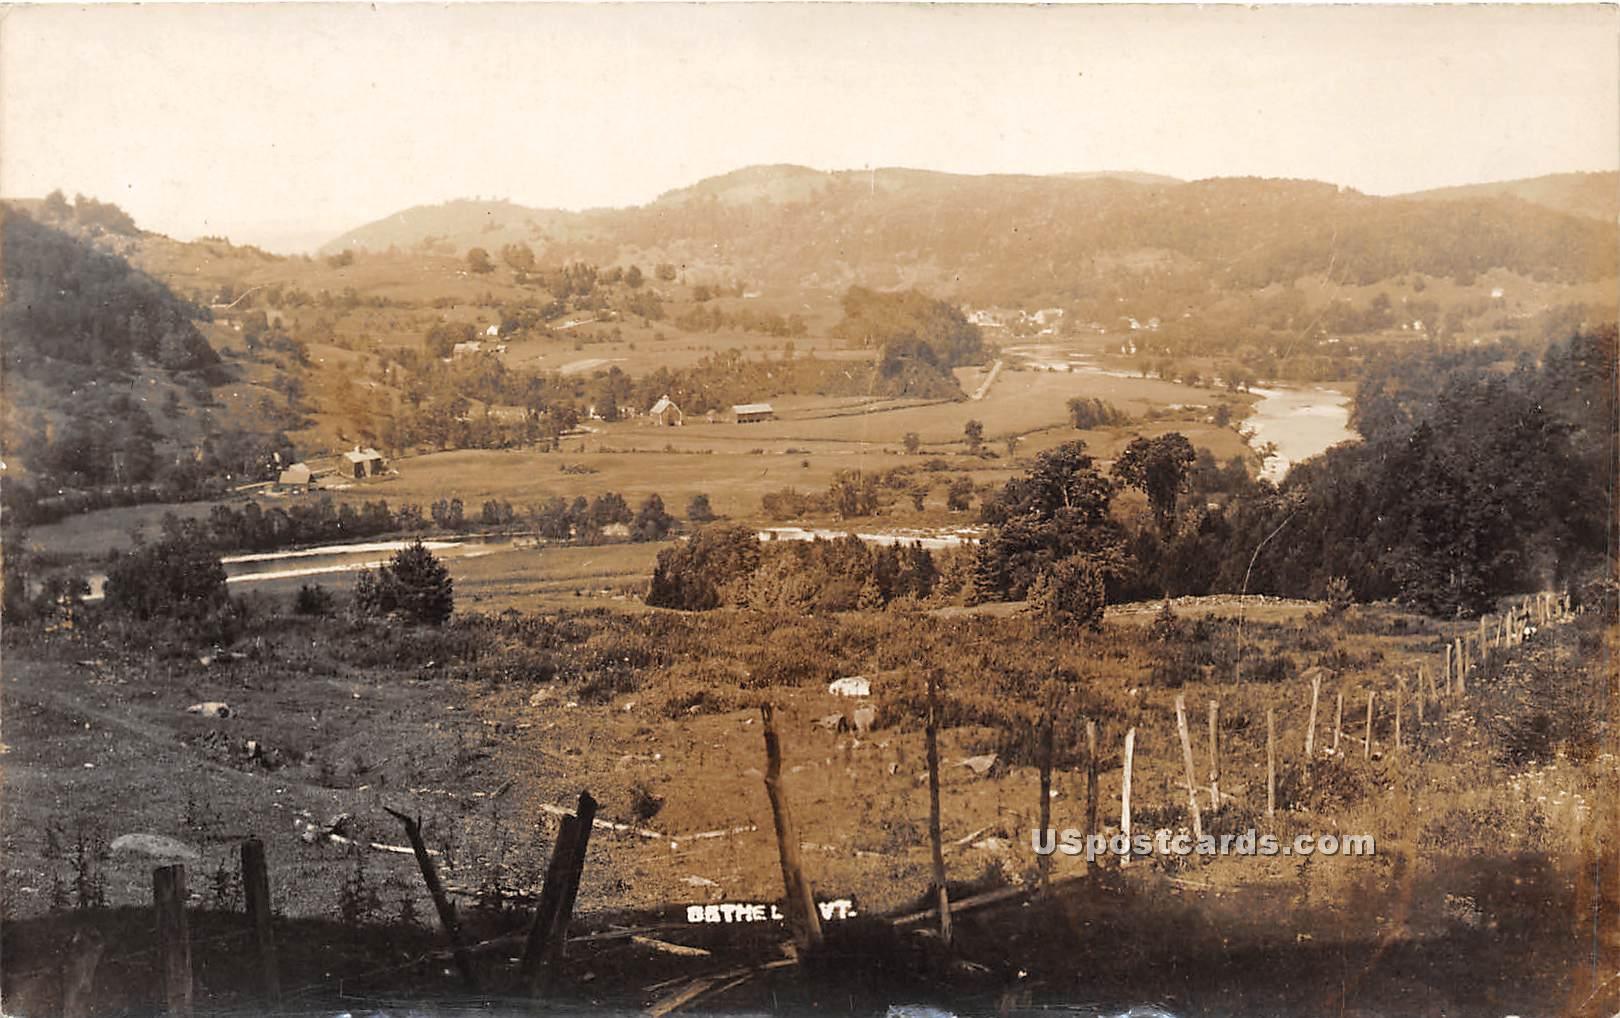 Birdseye View - Bethel, Vermont VT Postcard